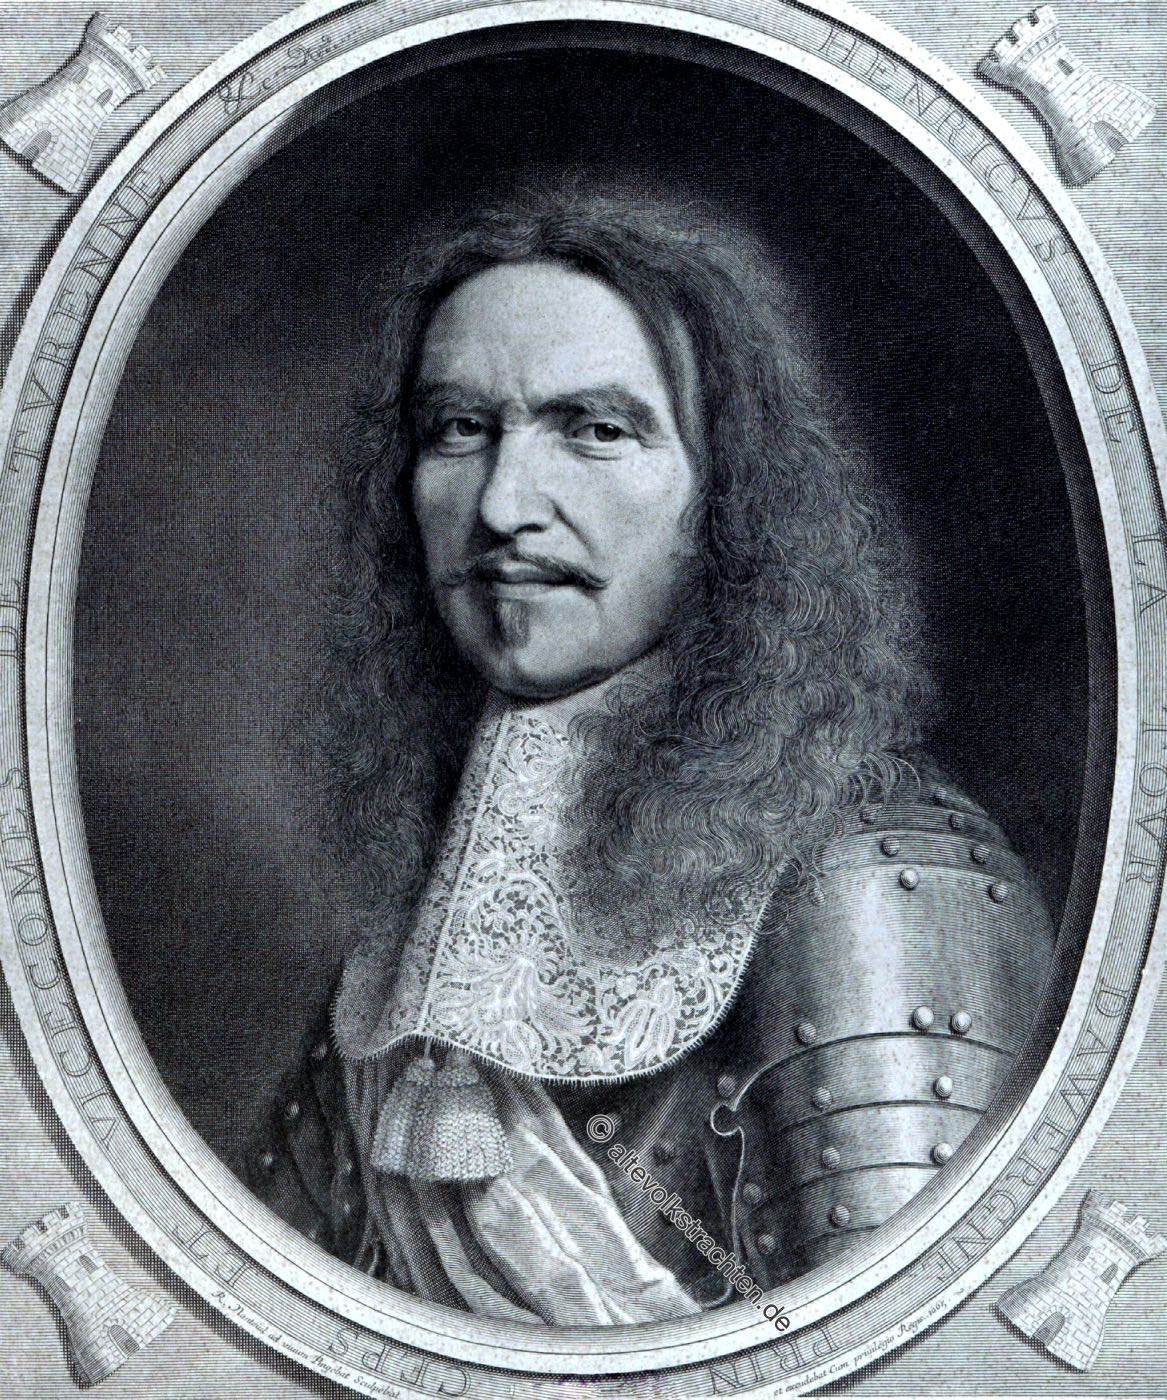 Turenne, Generalfeldmarschall, Marschall, Militär, Soldat, barock, dreissigjähriger Krieg,